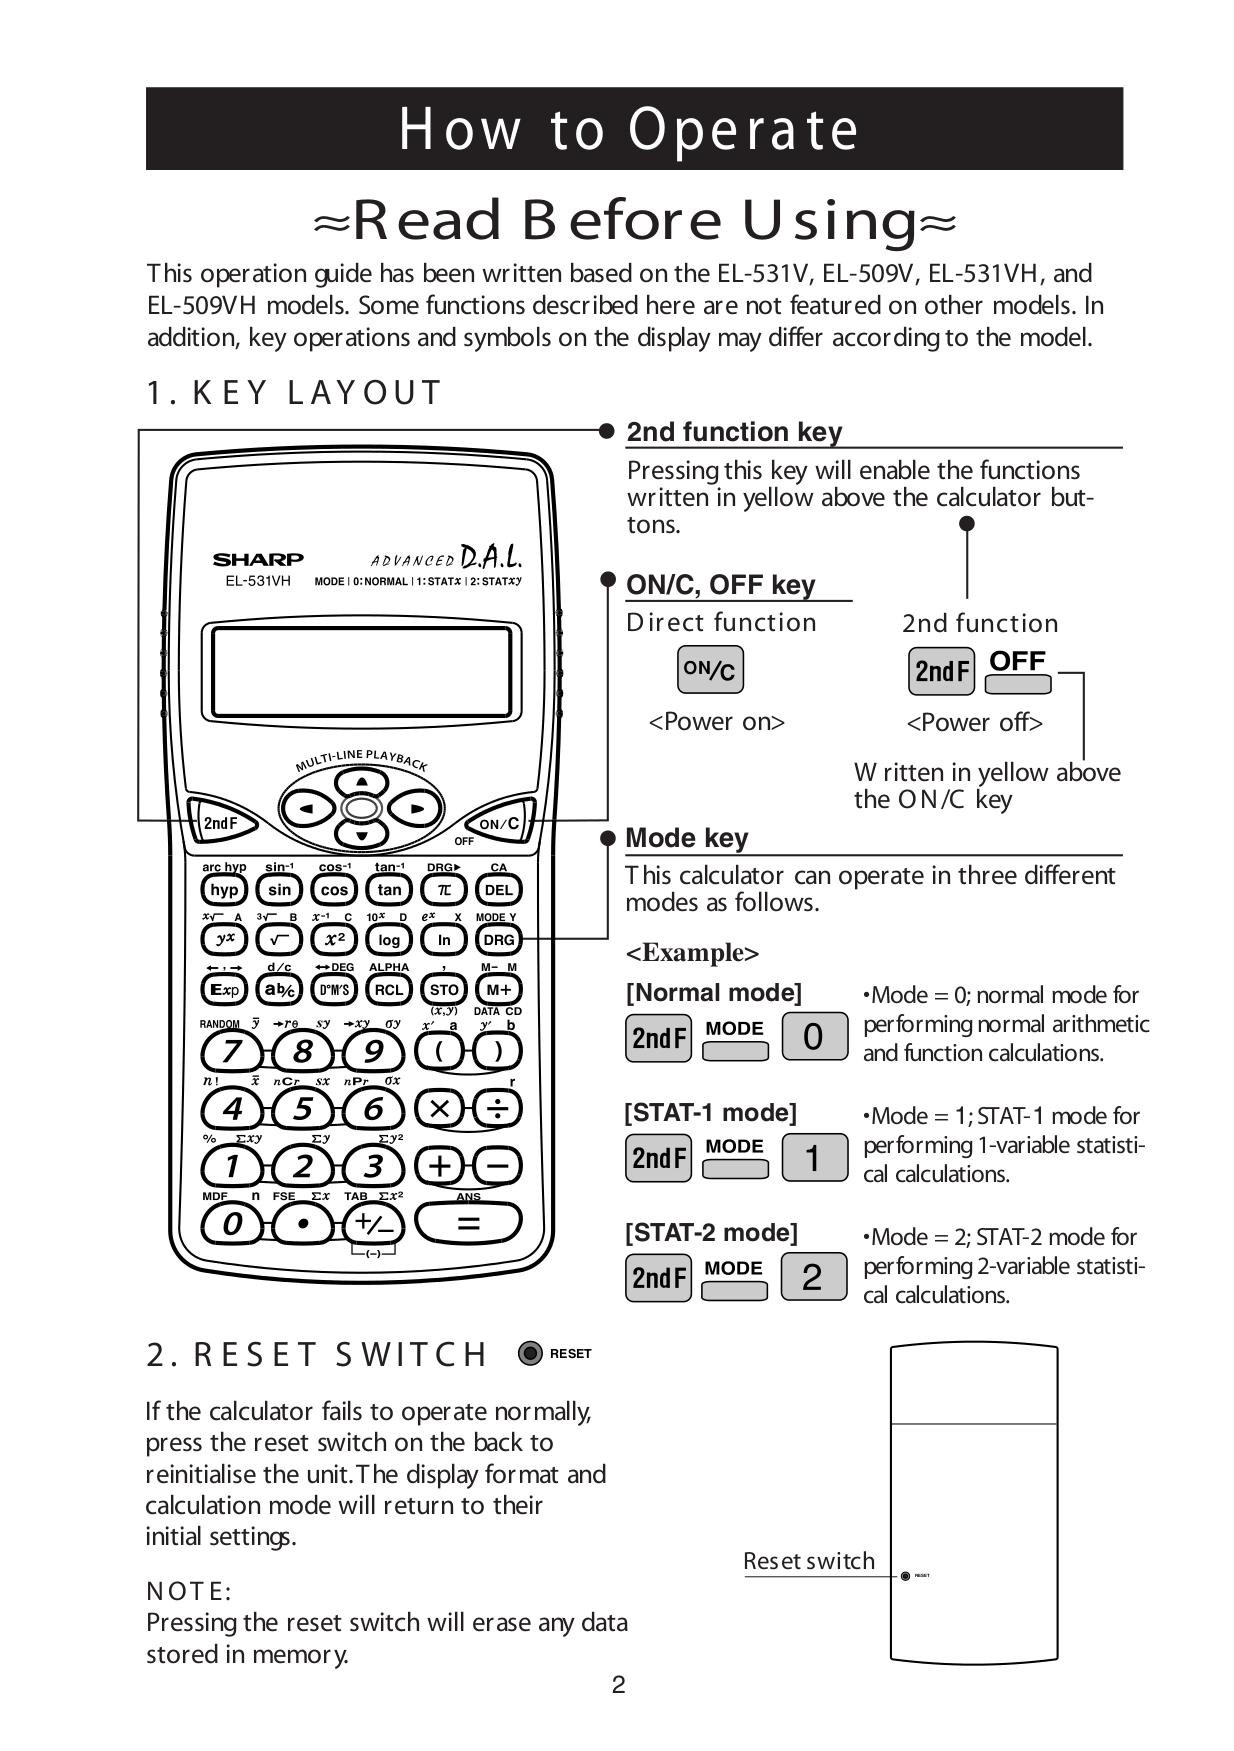 pdf manual for sharp calculator el 506w rh umlib com sharp el-506w user manual sharp scientific calculator el-506w manual